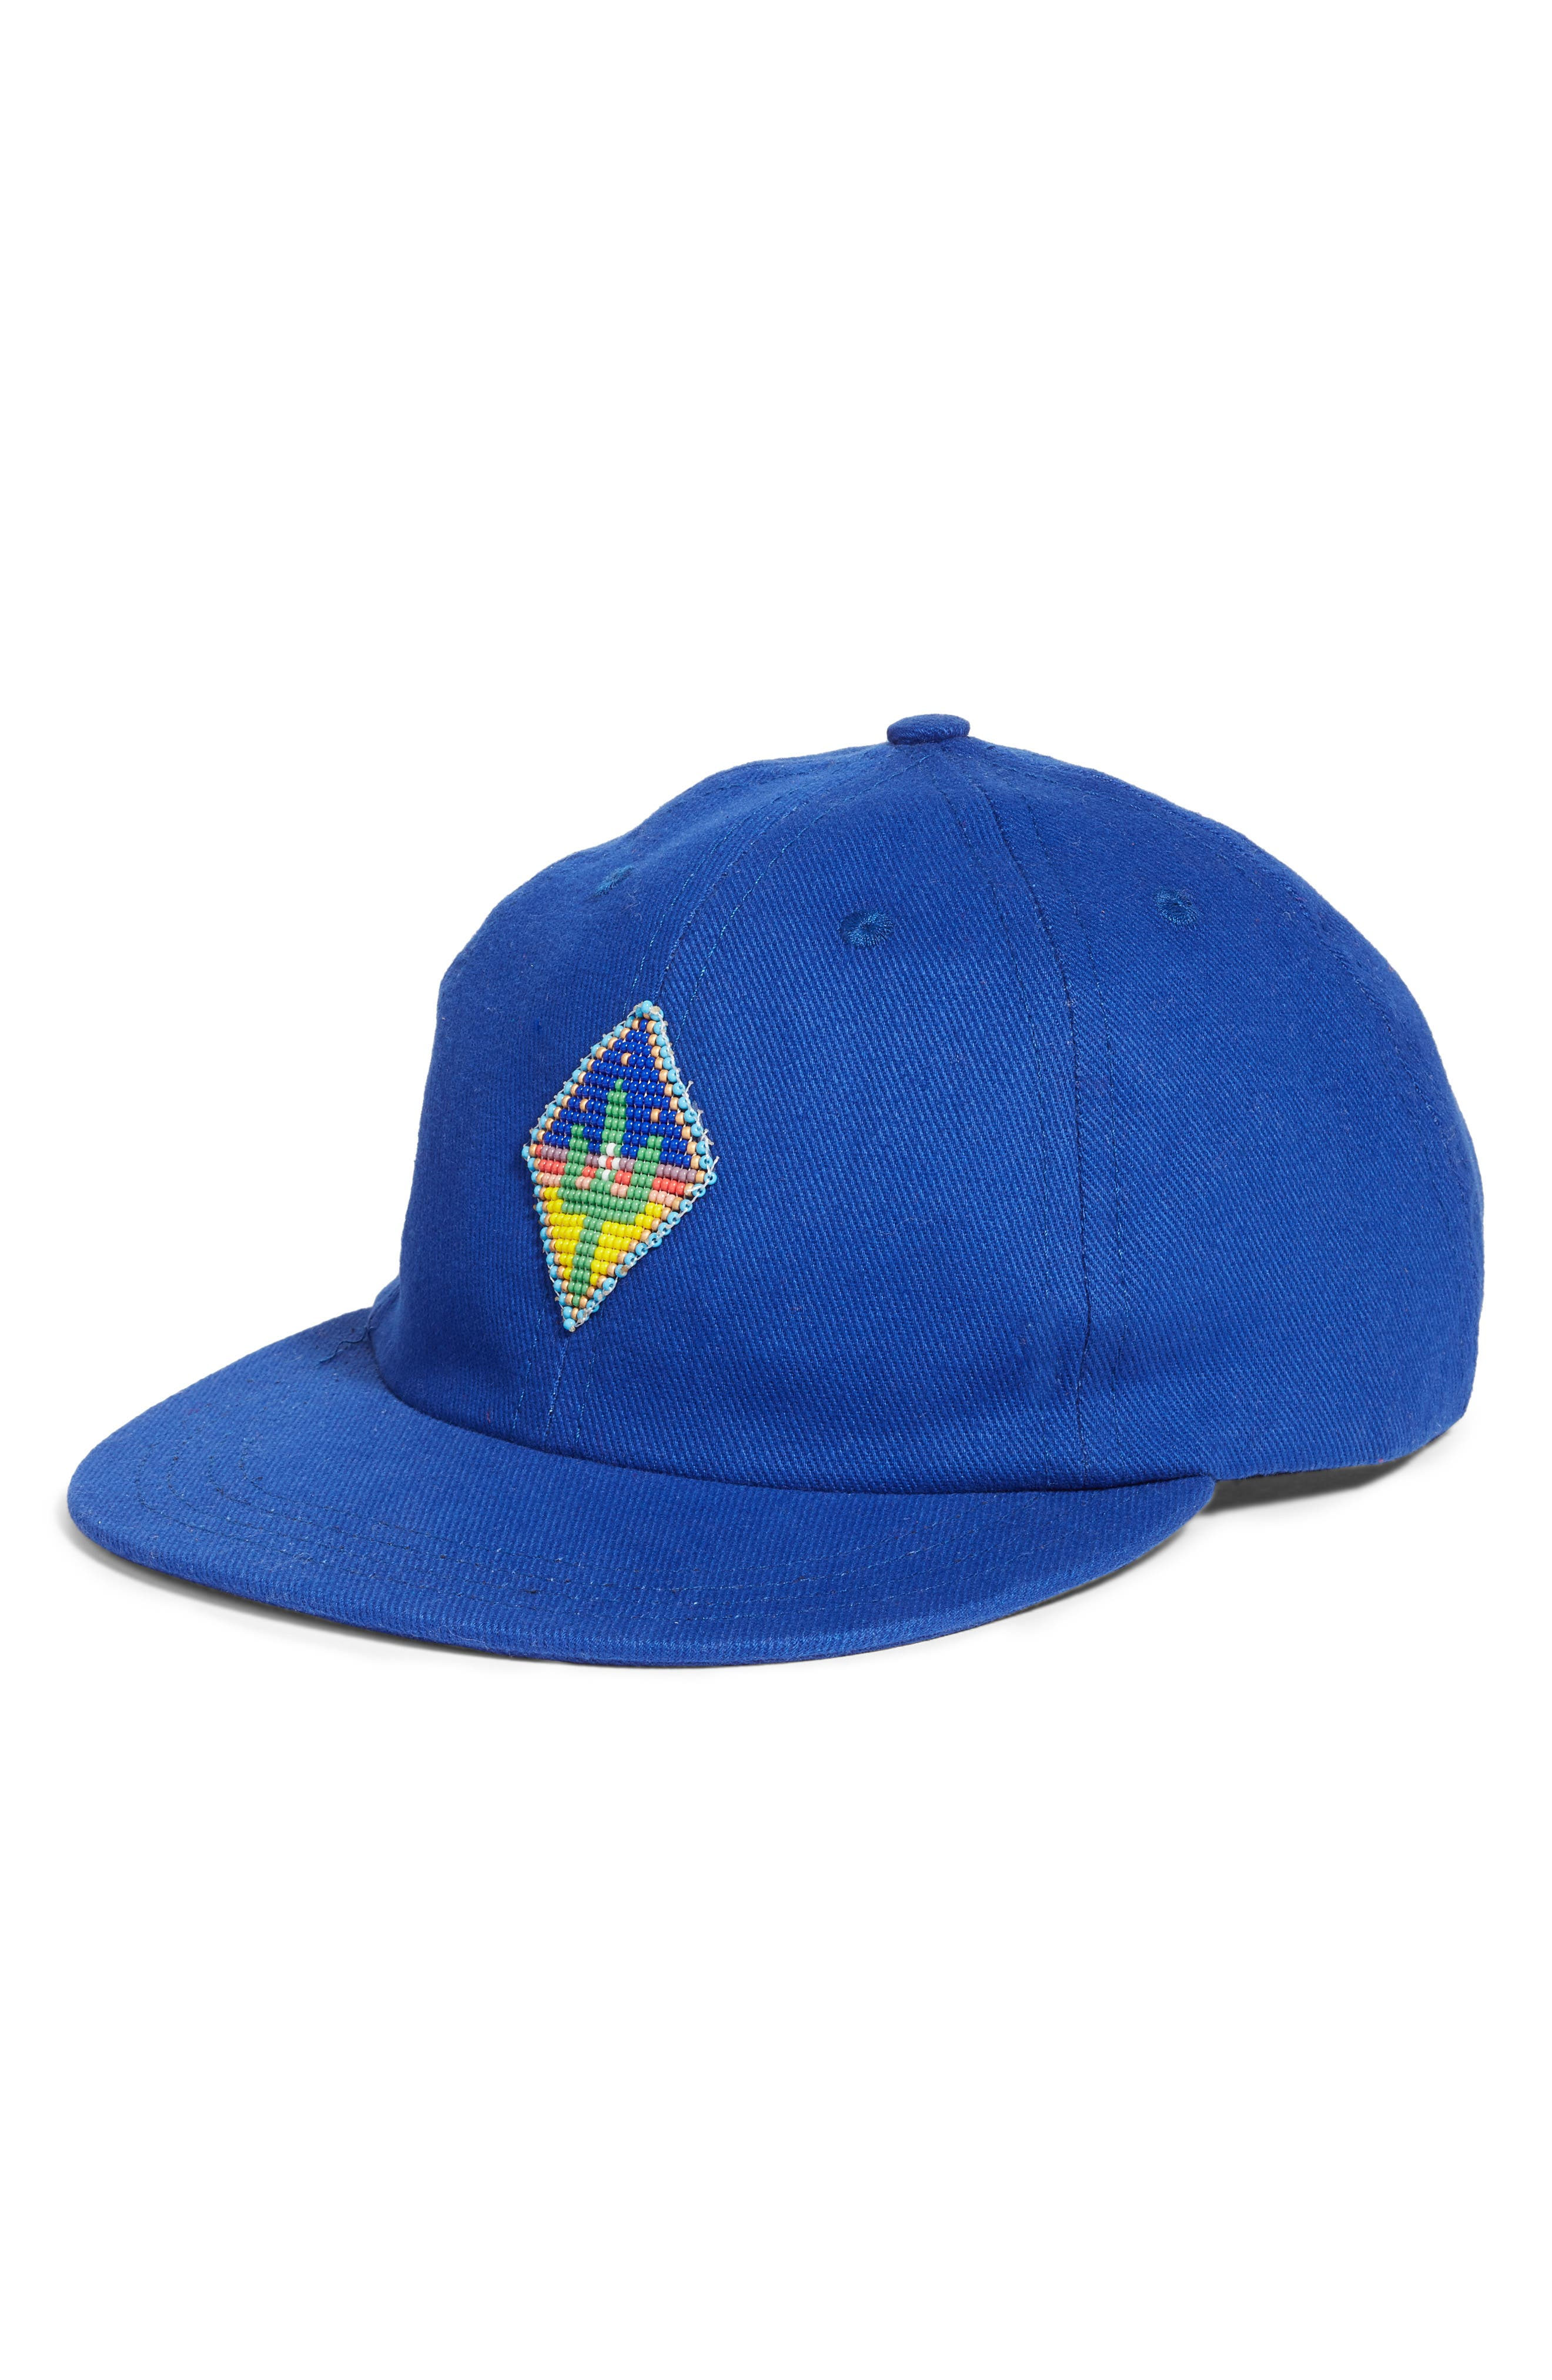 Beaded Cactus Baseball Hat,                             Main thumbnail 1, color,                             400